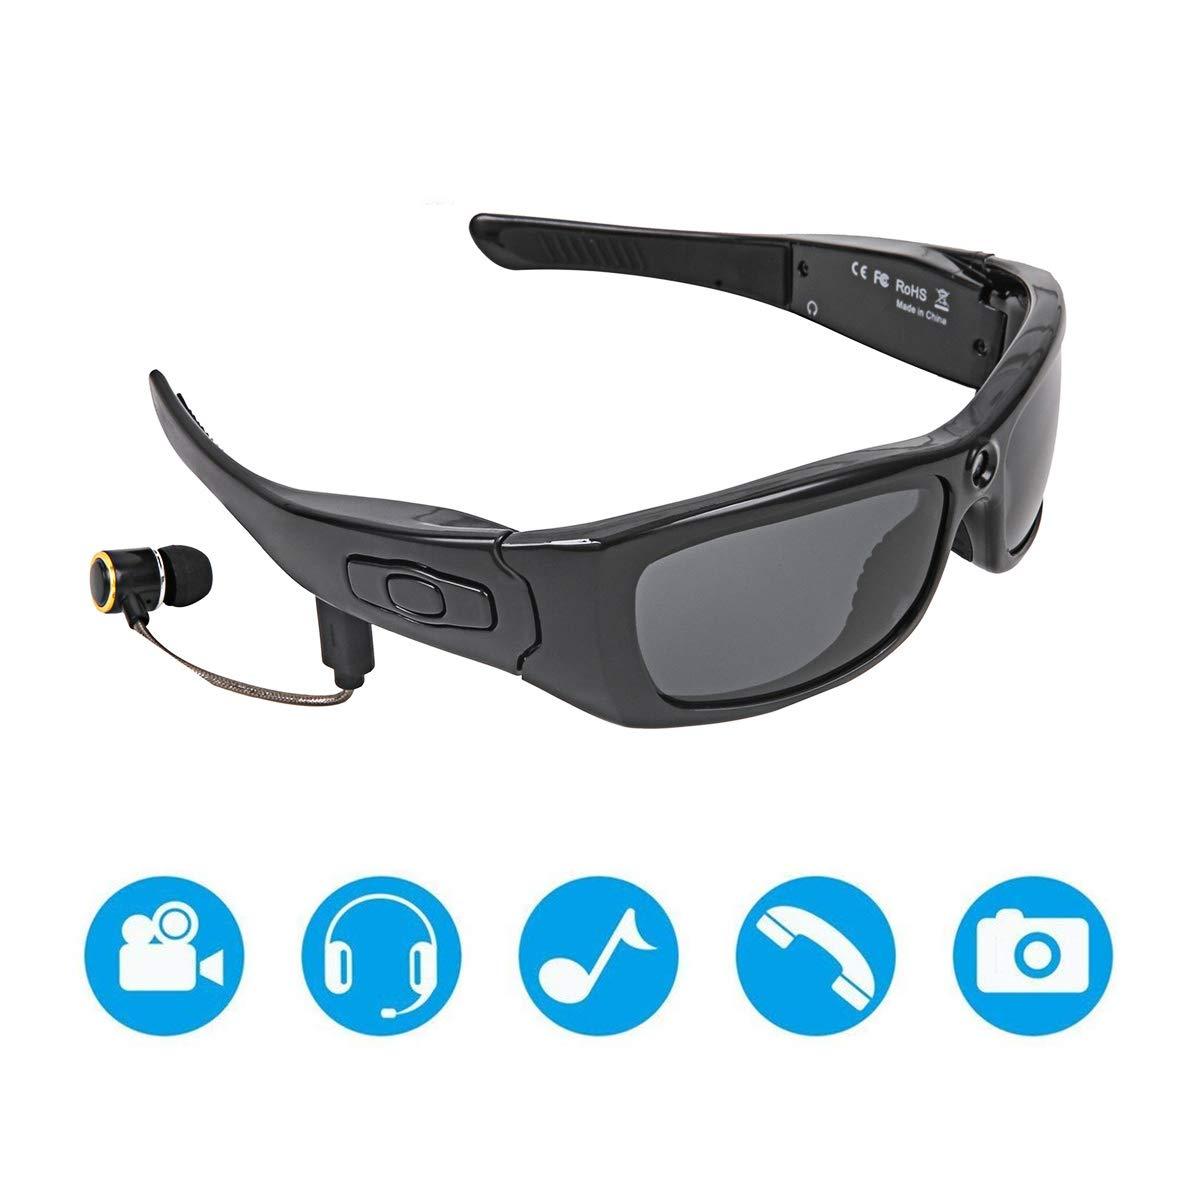 Amazon.com: Julitech Sport Waterproof Video Sunglasses ...